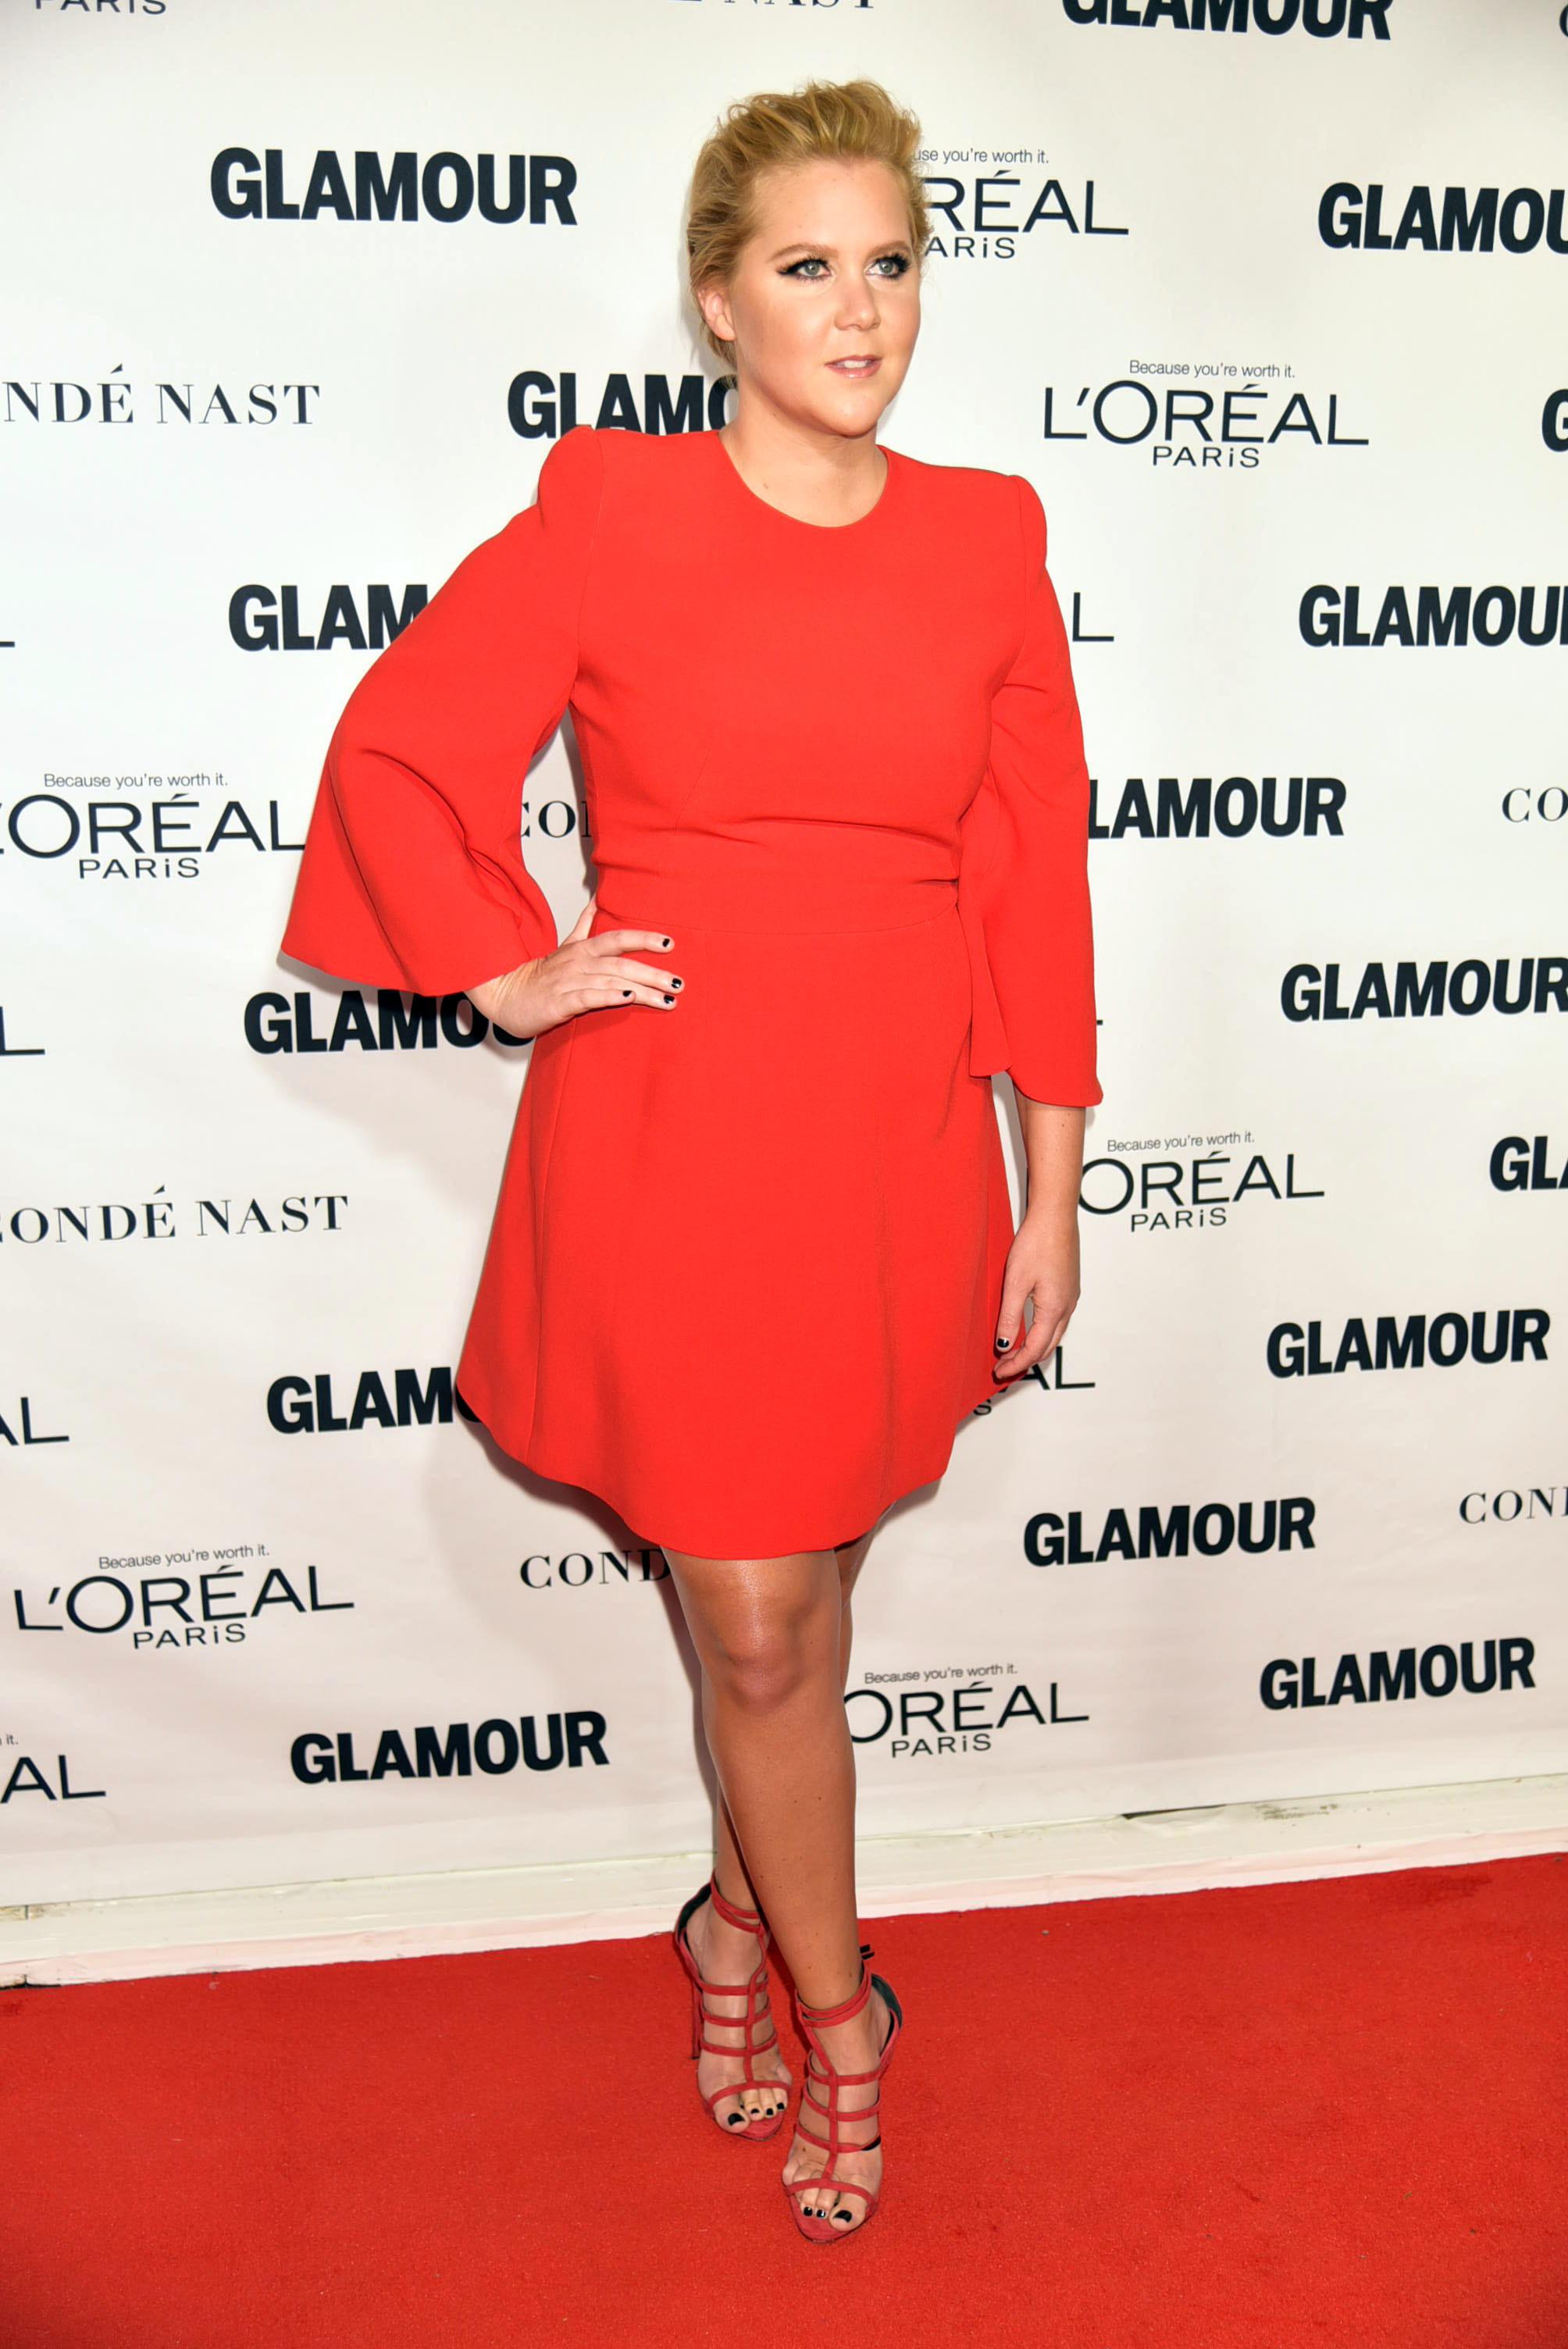 amy schumer glamour